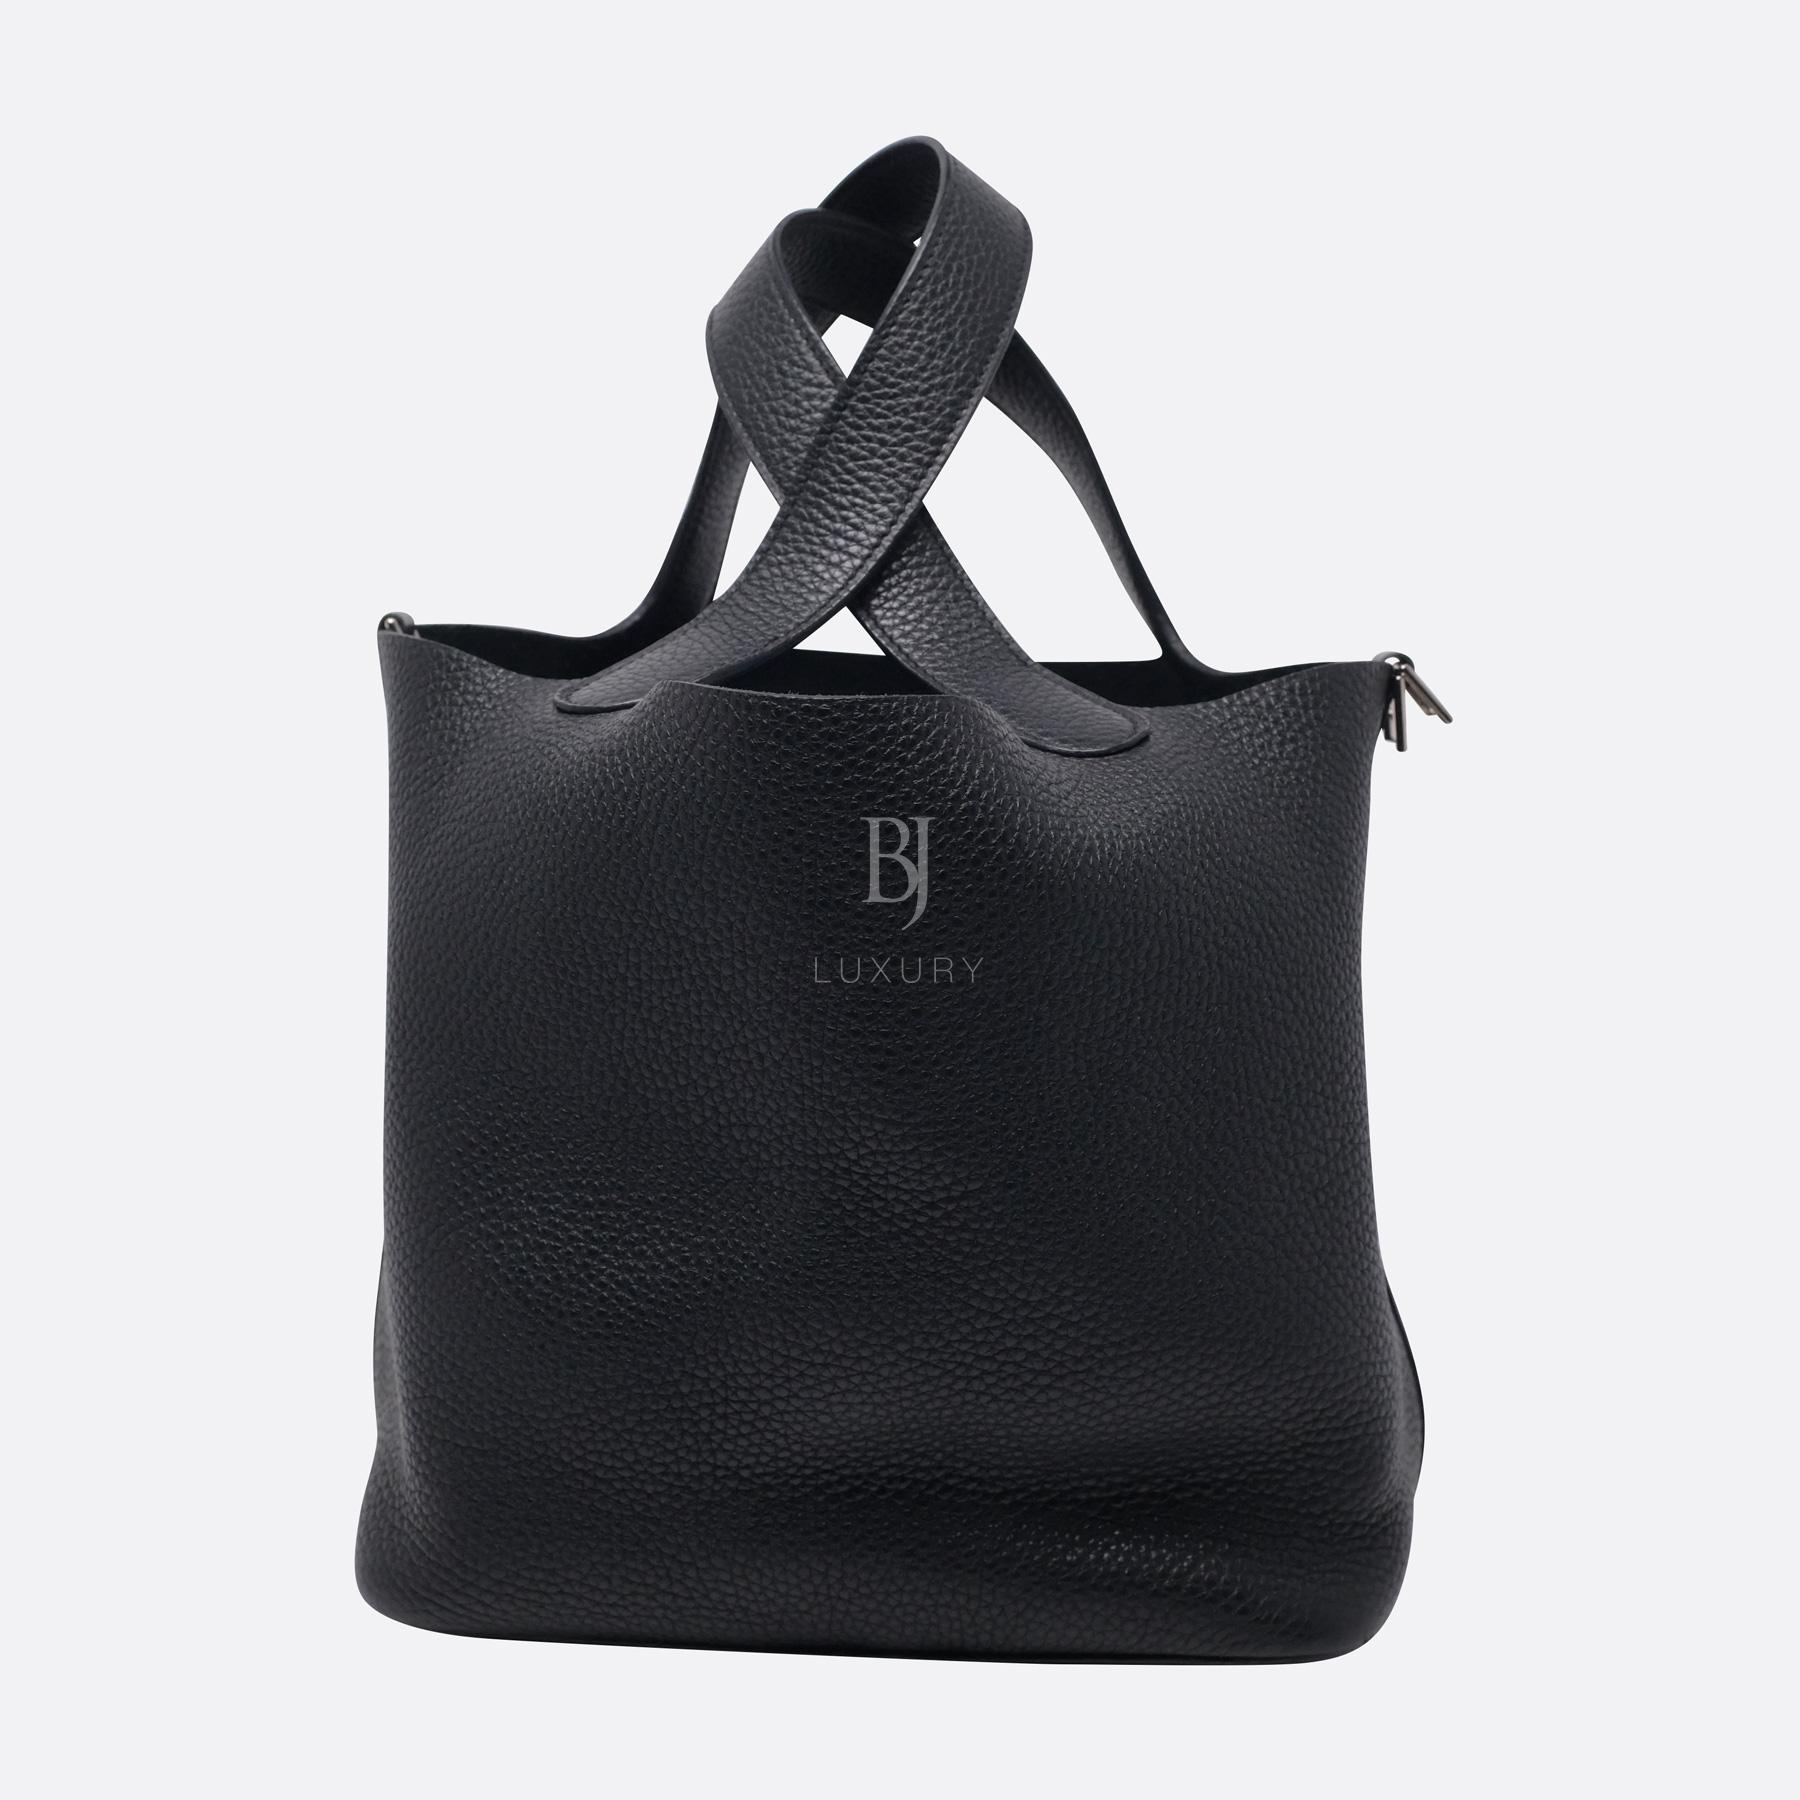 Hermes Picotin 22 Palladium Clemence BJ Luxury 3.jpg